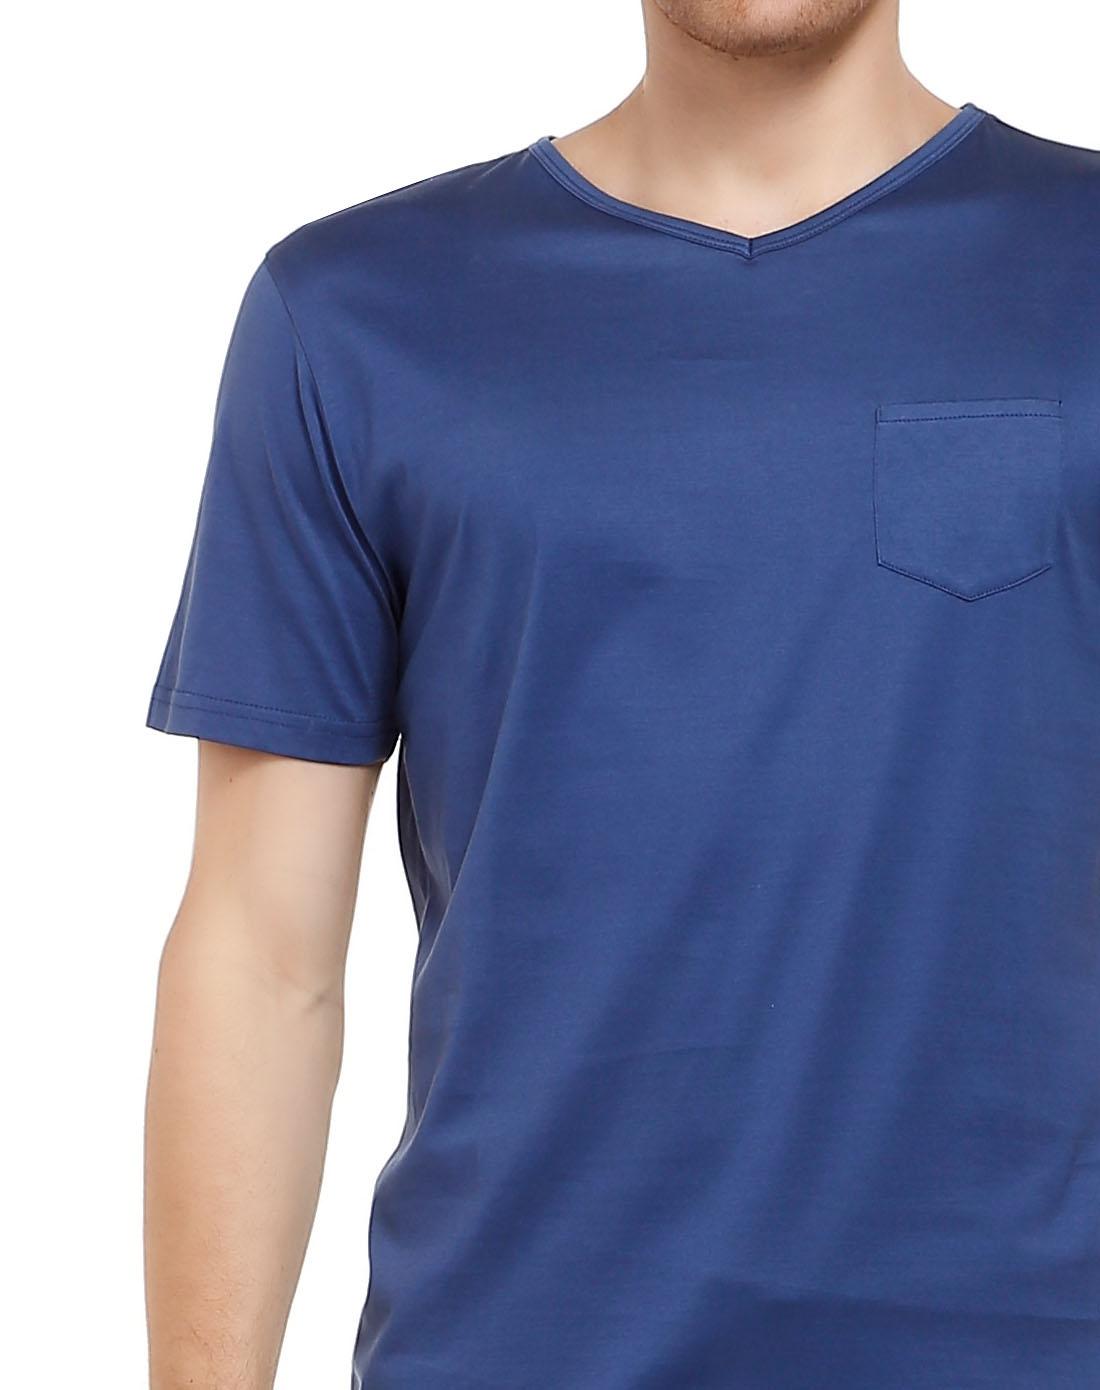 baldassari 夏日简约纯深蓝色短袖t恤